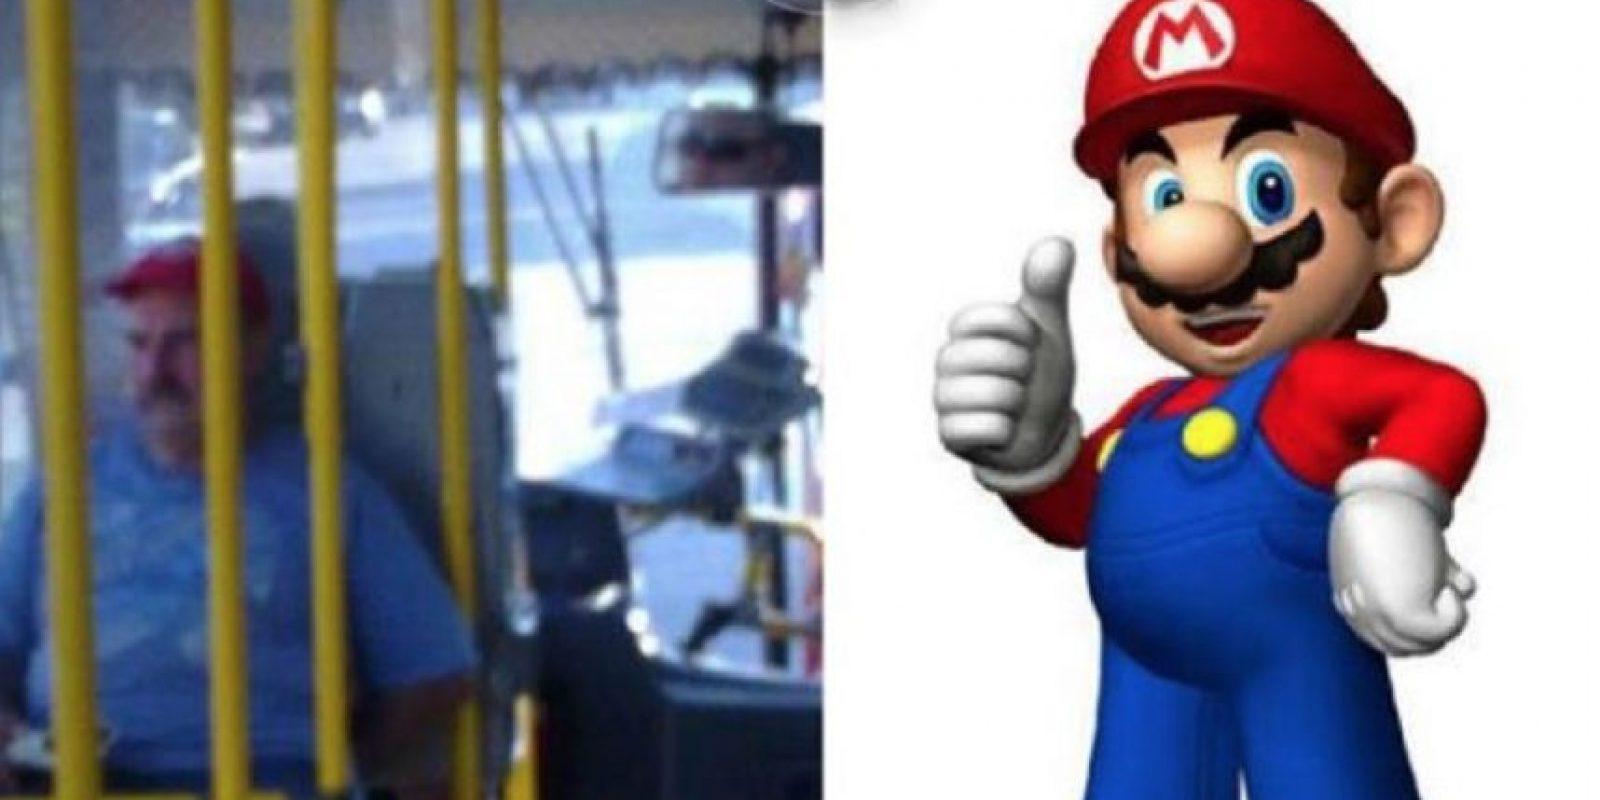 Súper Mario Foto:Parecidos De Bondis/Facebook